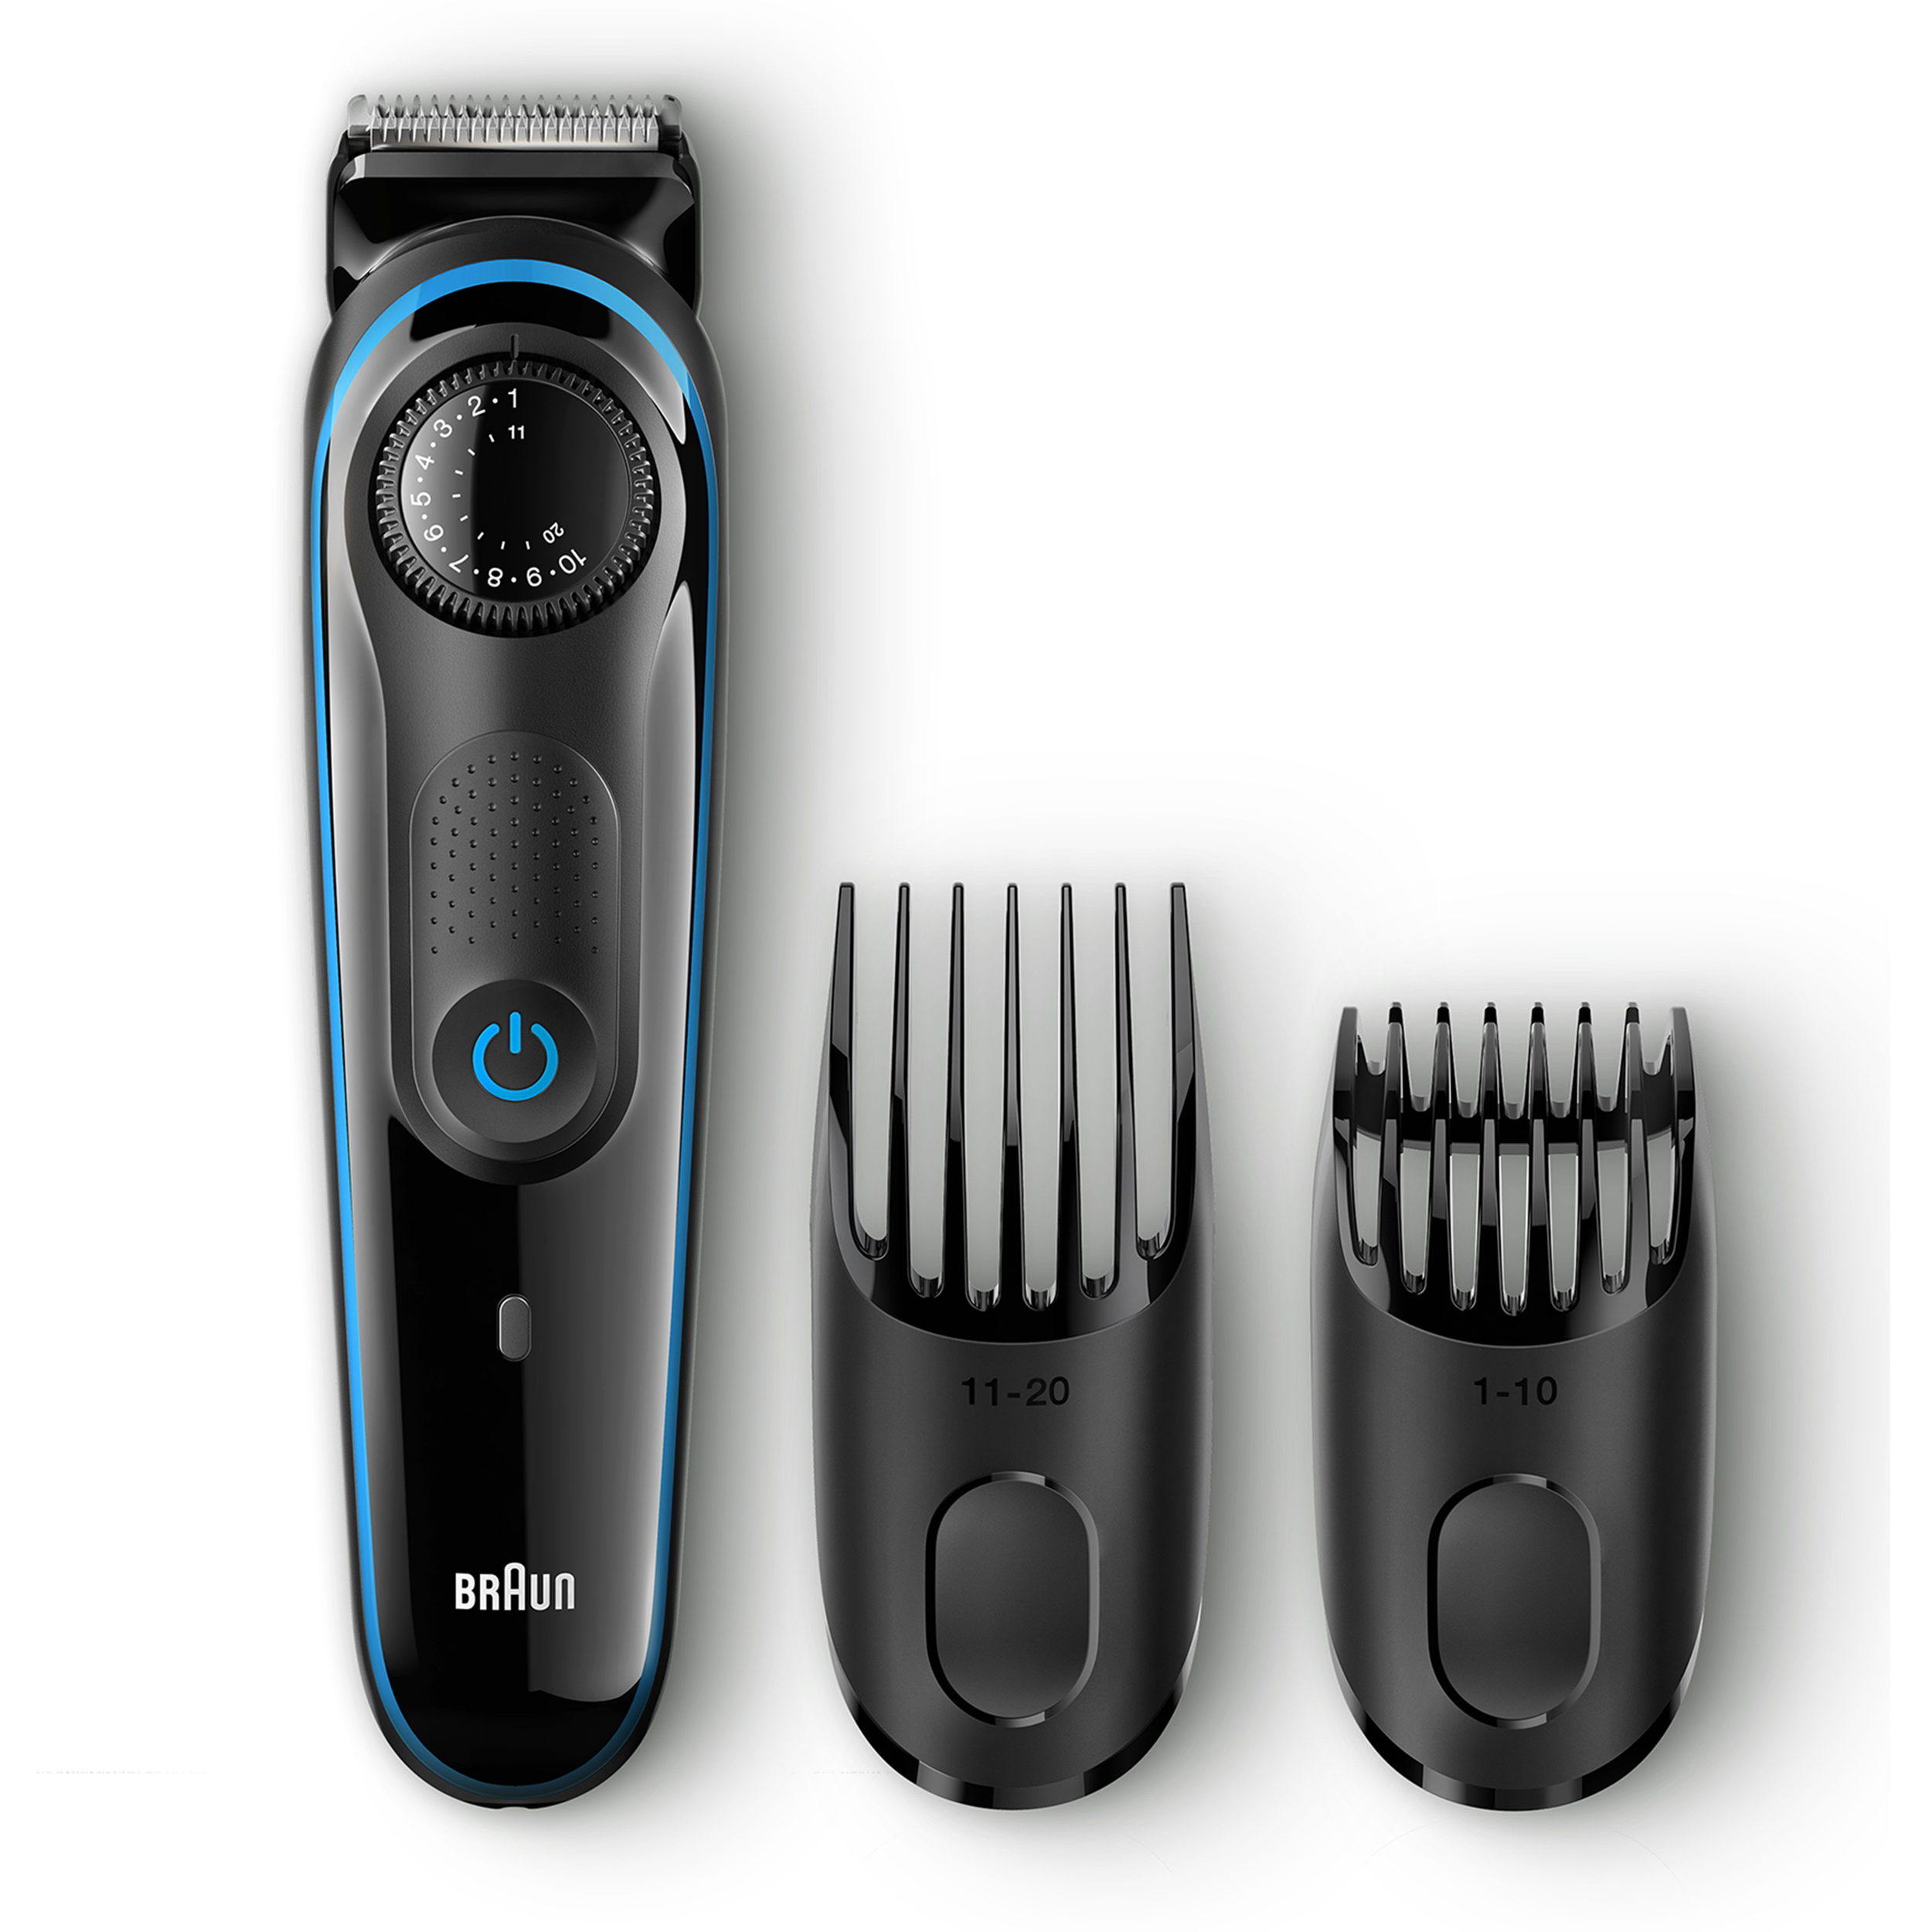 Braun BT3040 Men's Beard Trimmer/Hair Clipper, 39 Precision Length Settings for Ultimate Precision, Includes Fusion ProGlide Razor ($5 Rebate Available)